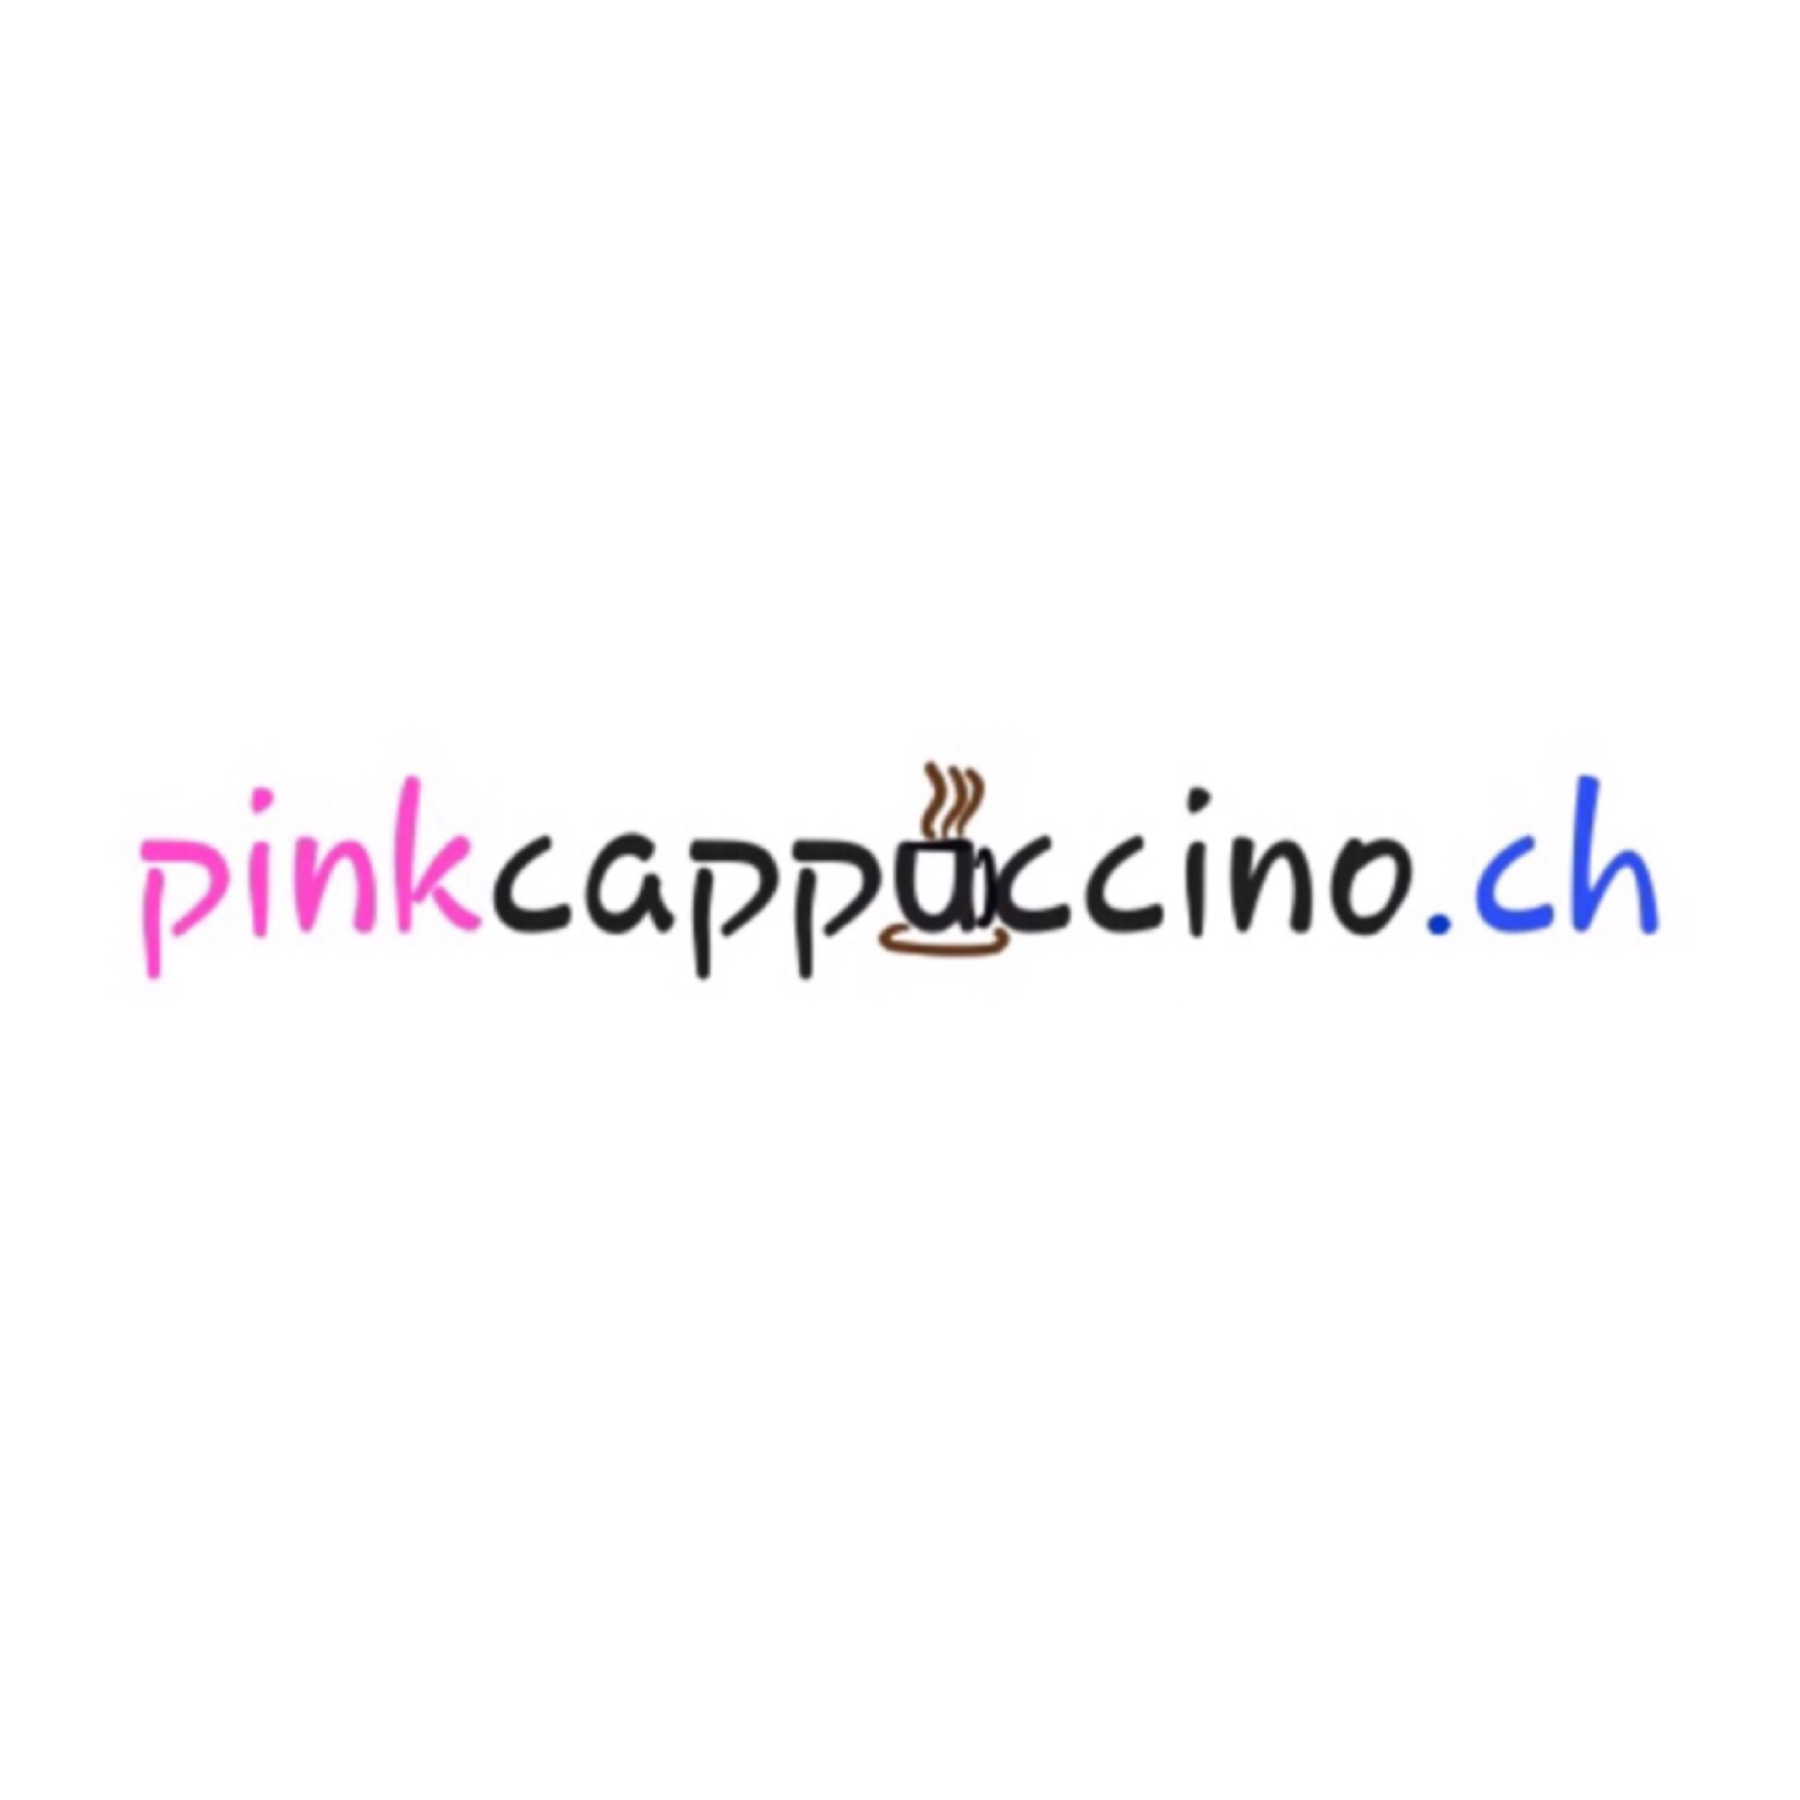 pinkcappuccino.png